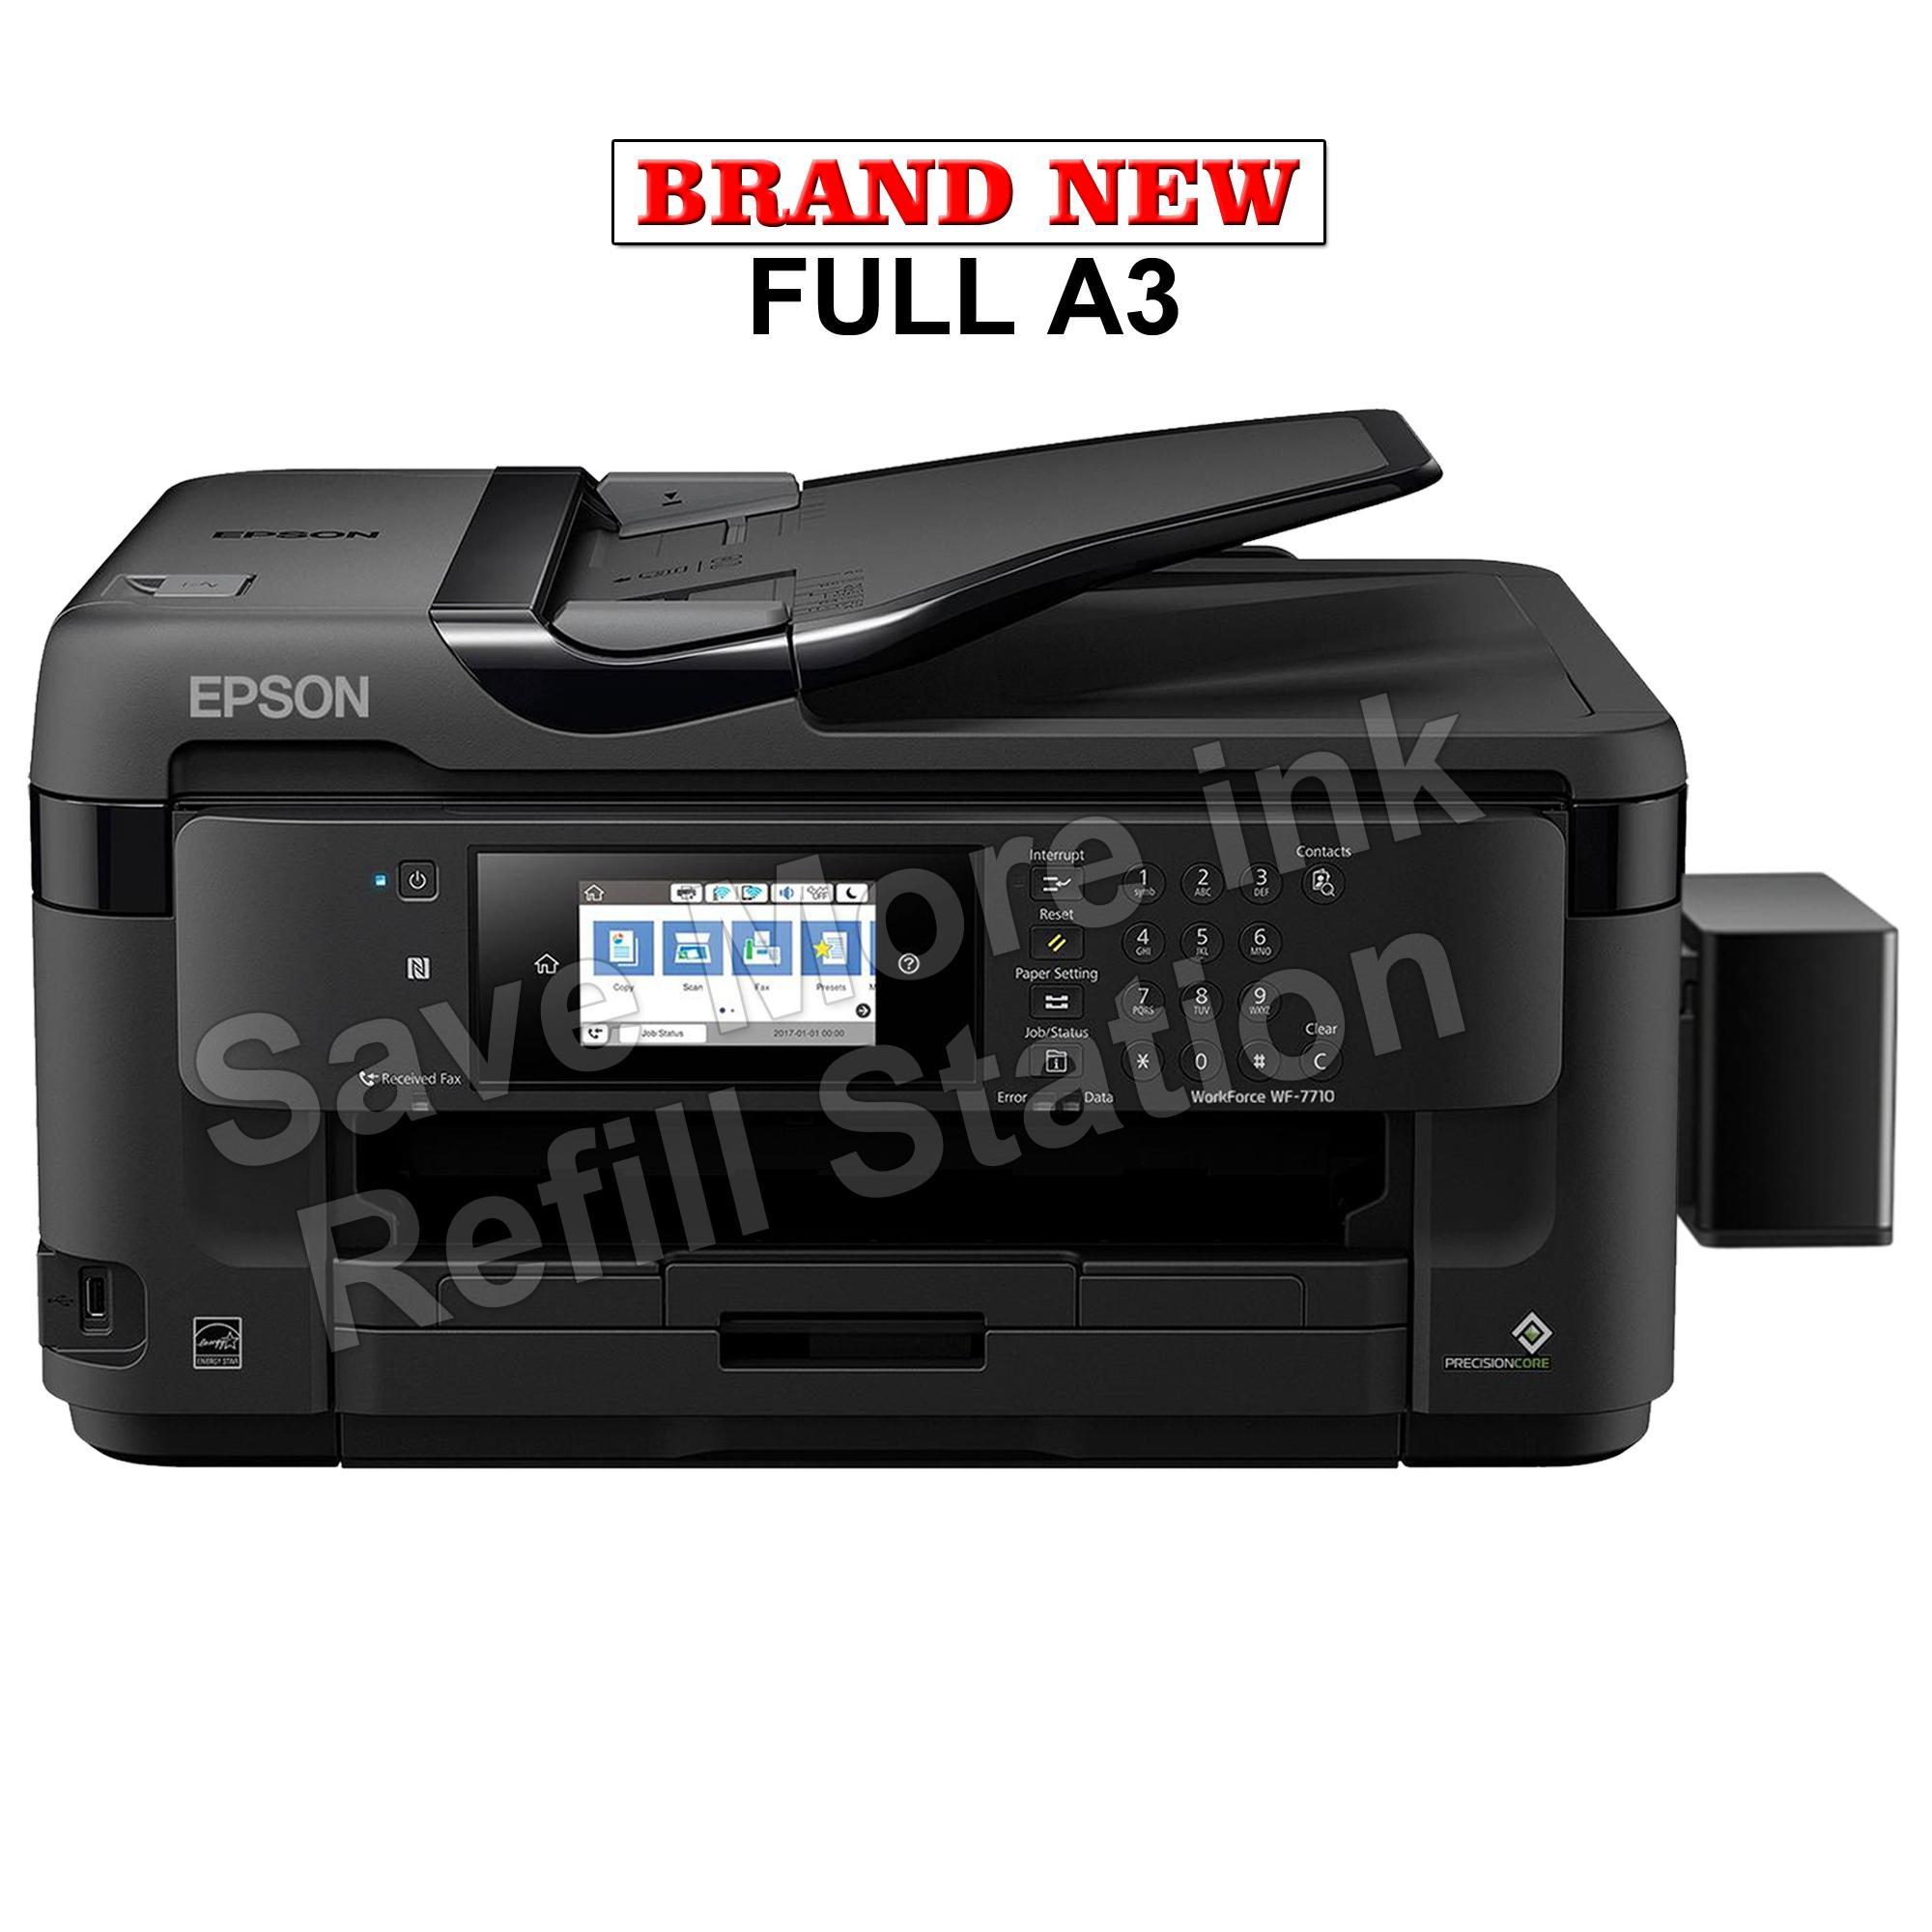 Epson Philippines Price List Printer Scanner Ink Head Tmu 220 New Workforce Wf 7710dwf A3 W Ciss No Inks 7710